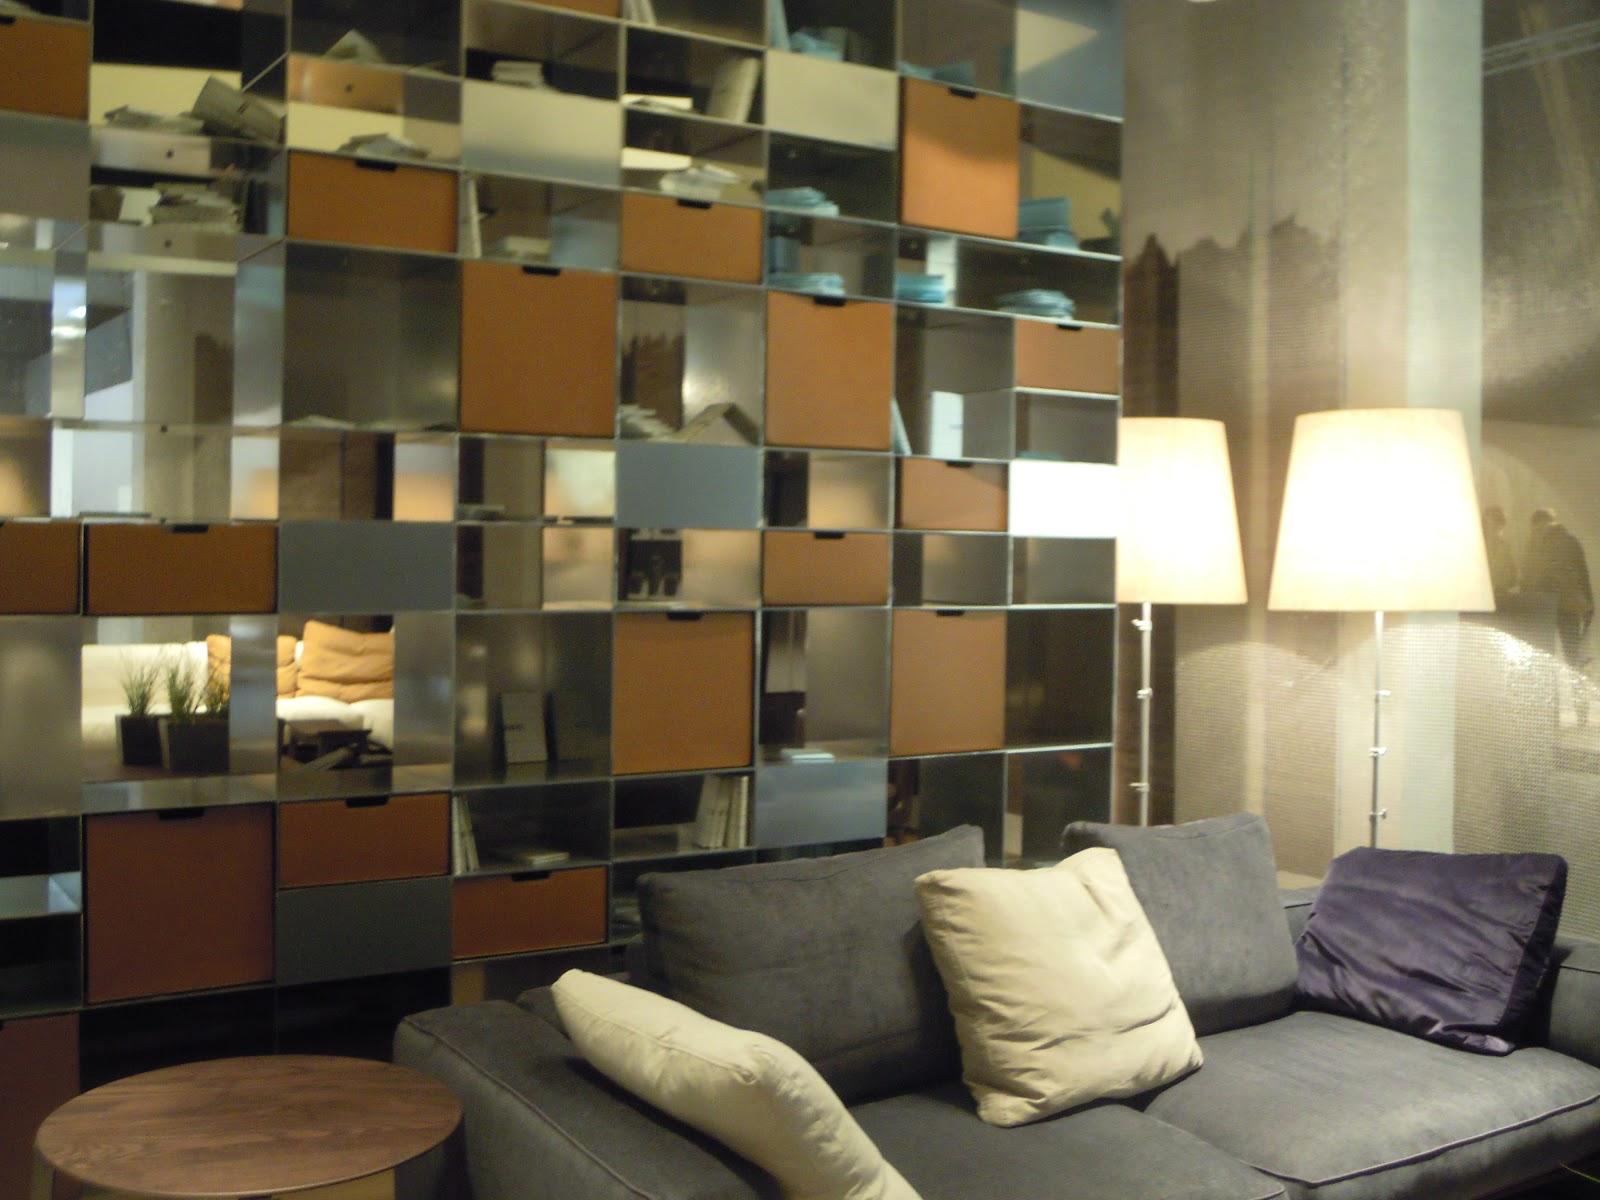 http://1.bp.blogspot.com/-baMMFFCQo8I/UJDvvJvVyJI/AAAAAAAAASE/gvqdF3gmawQ/s1600/Interieurbeurs+Kortrijk+039.JPG